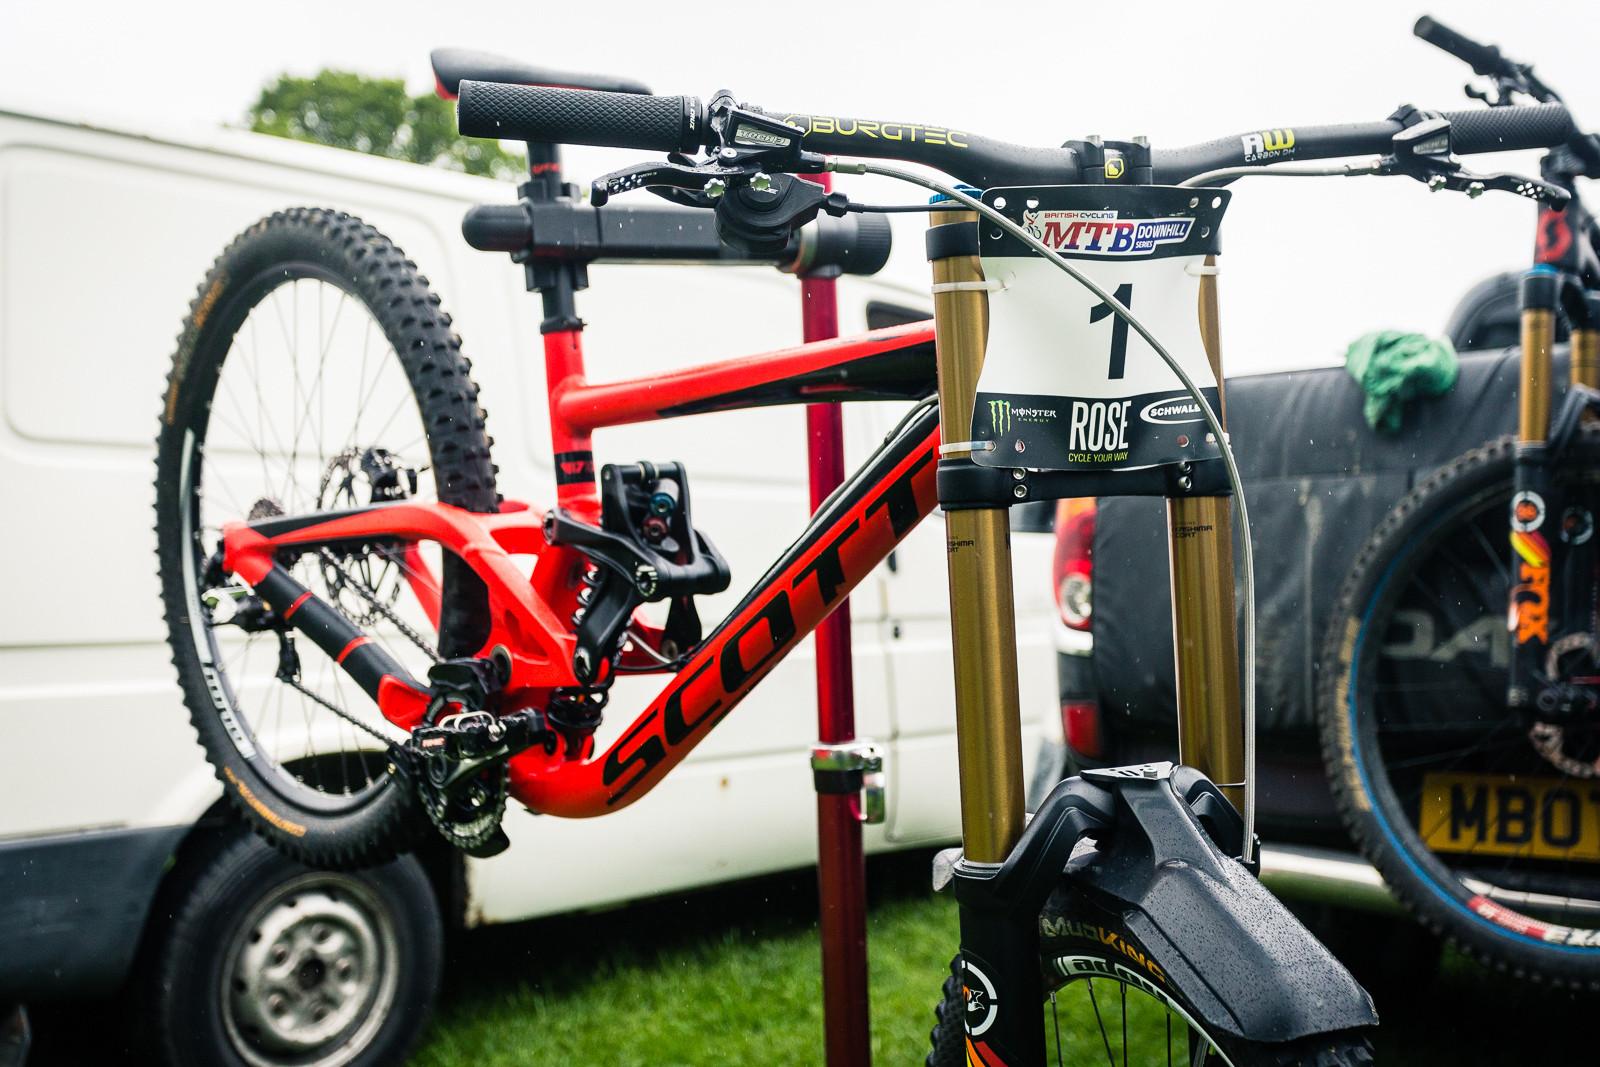 Marc Beaumont's Scott Gambler - PIT BITS - British Downhill Series, Llangollen - Mountain Biking Pictures - Vital MTB